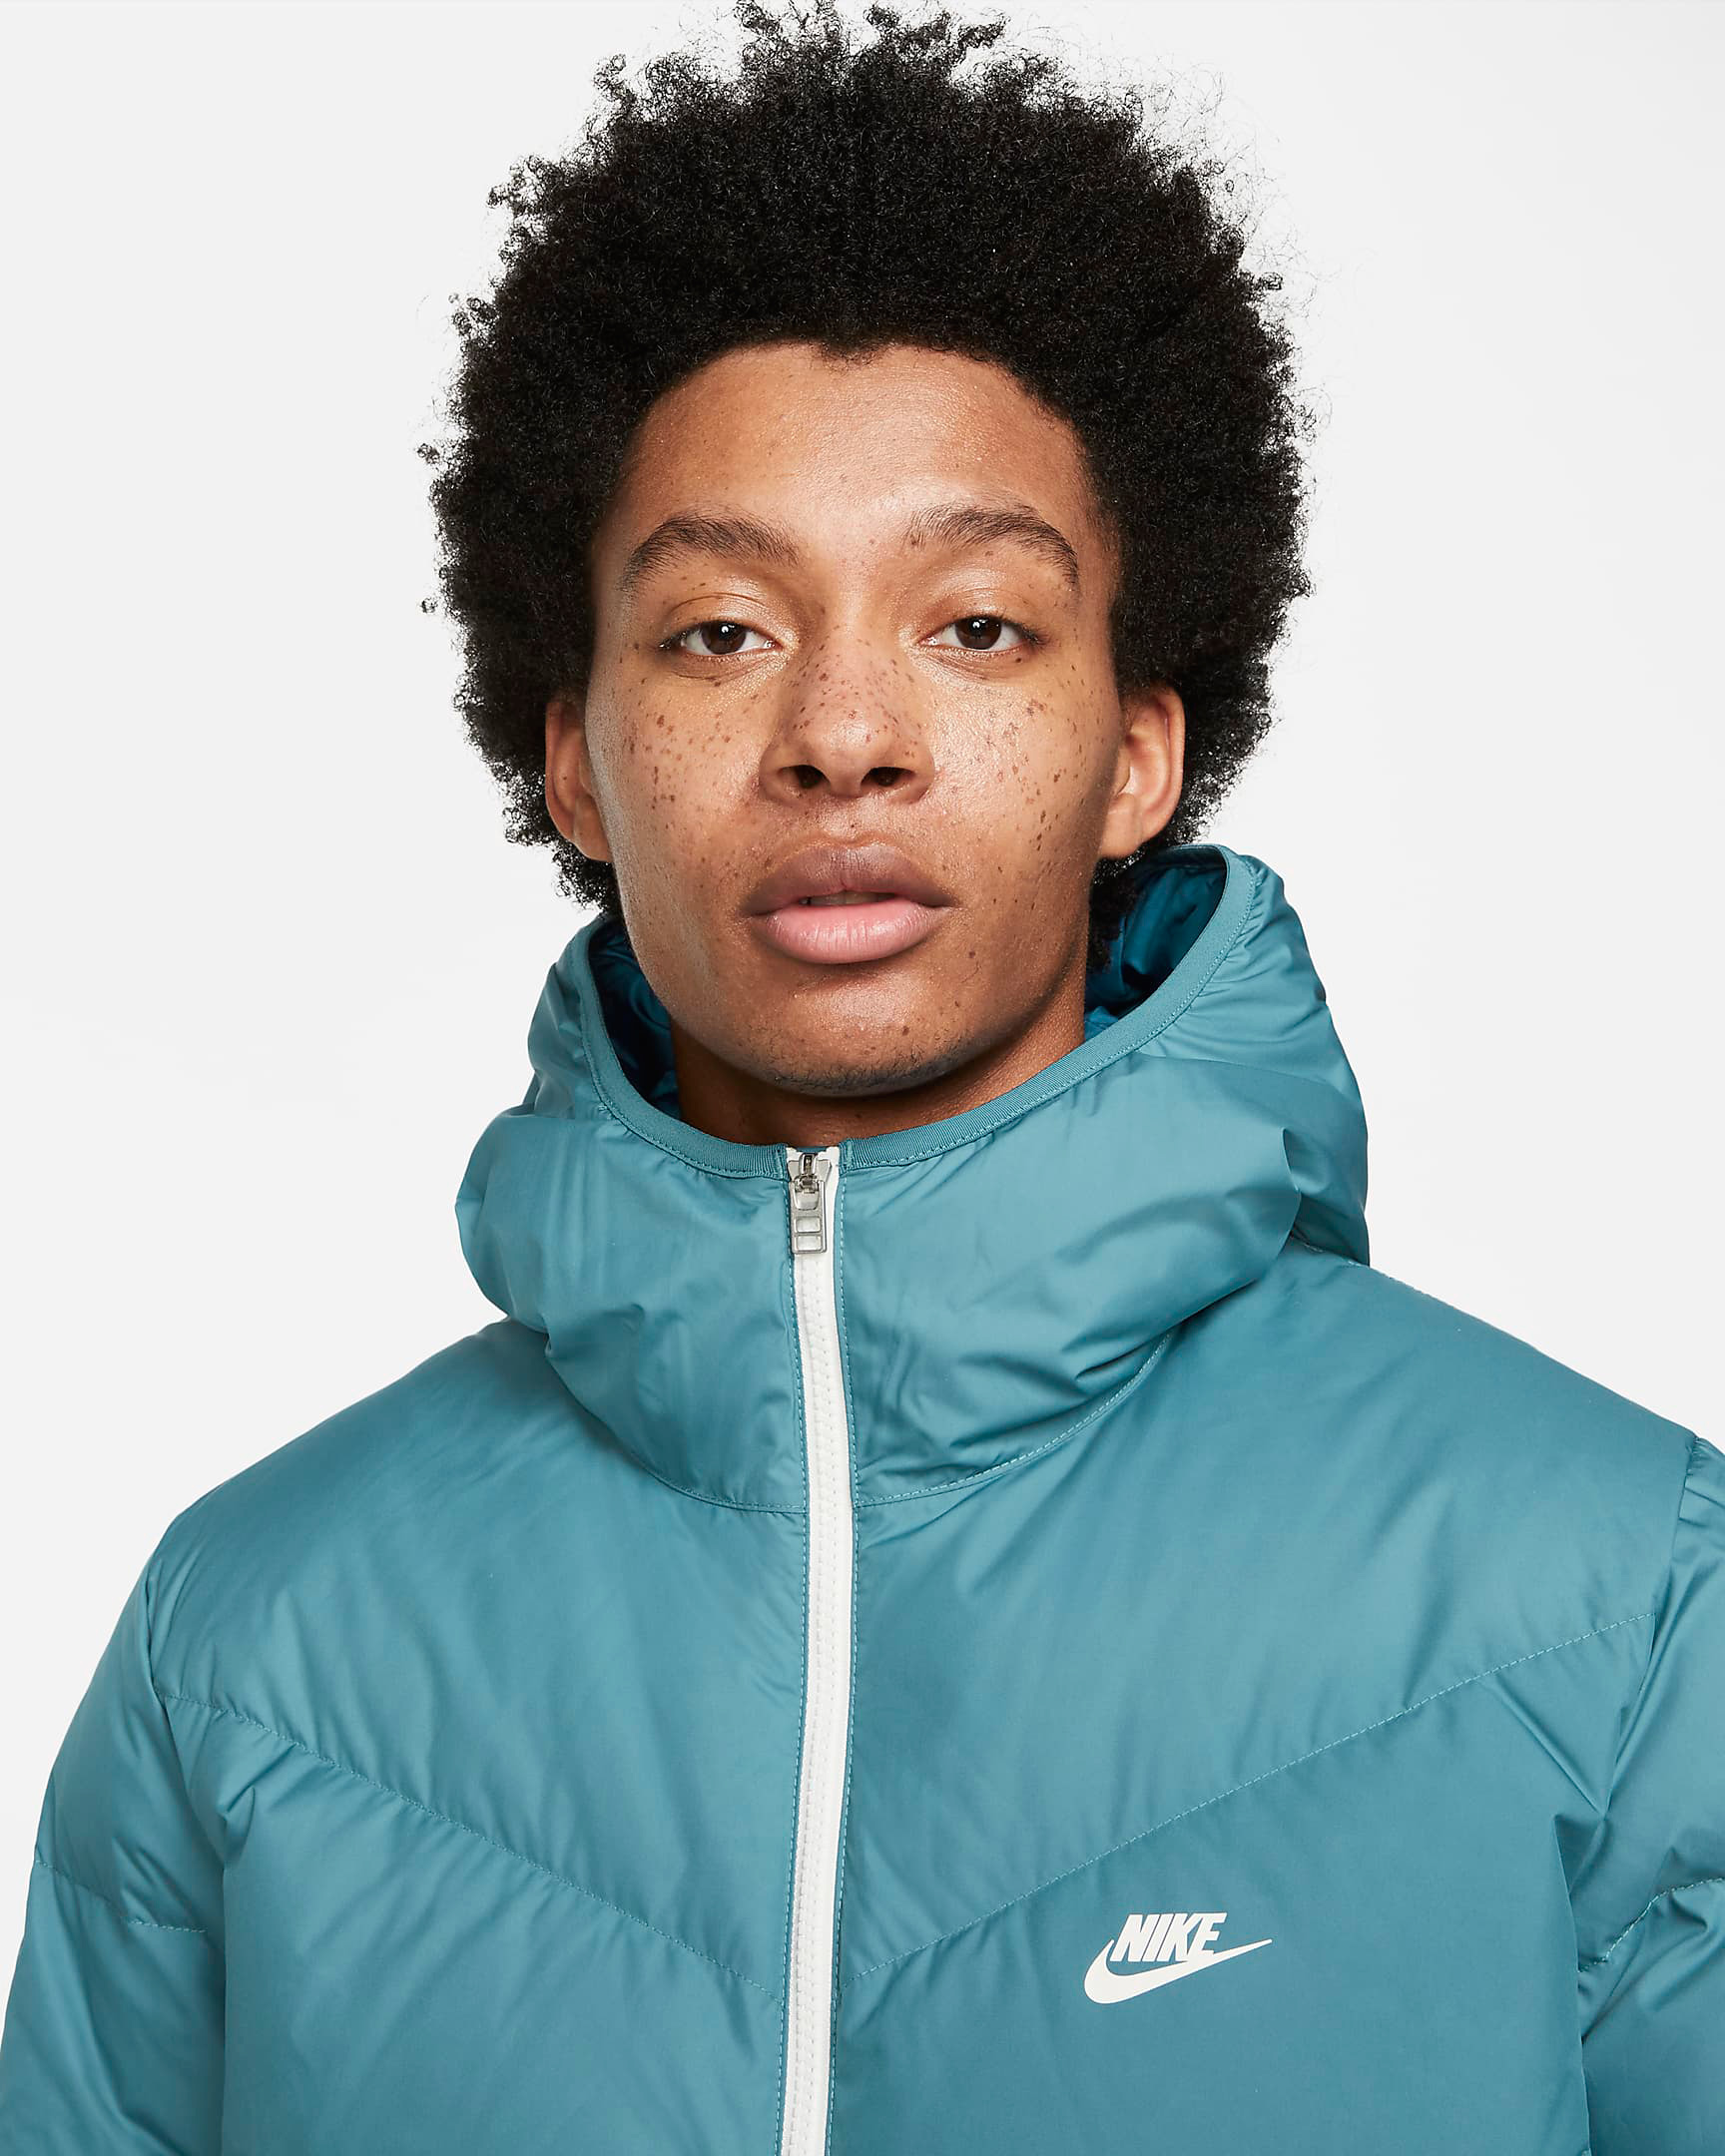 nike-sportswear-storm-fit-windrunner-jacket-rift-blue-court-blue-sail-3